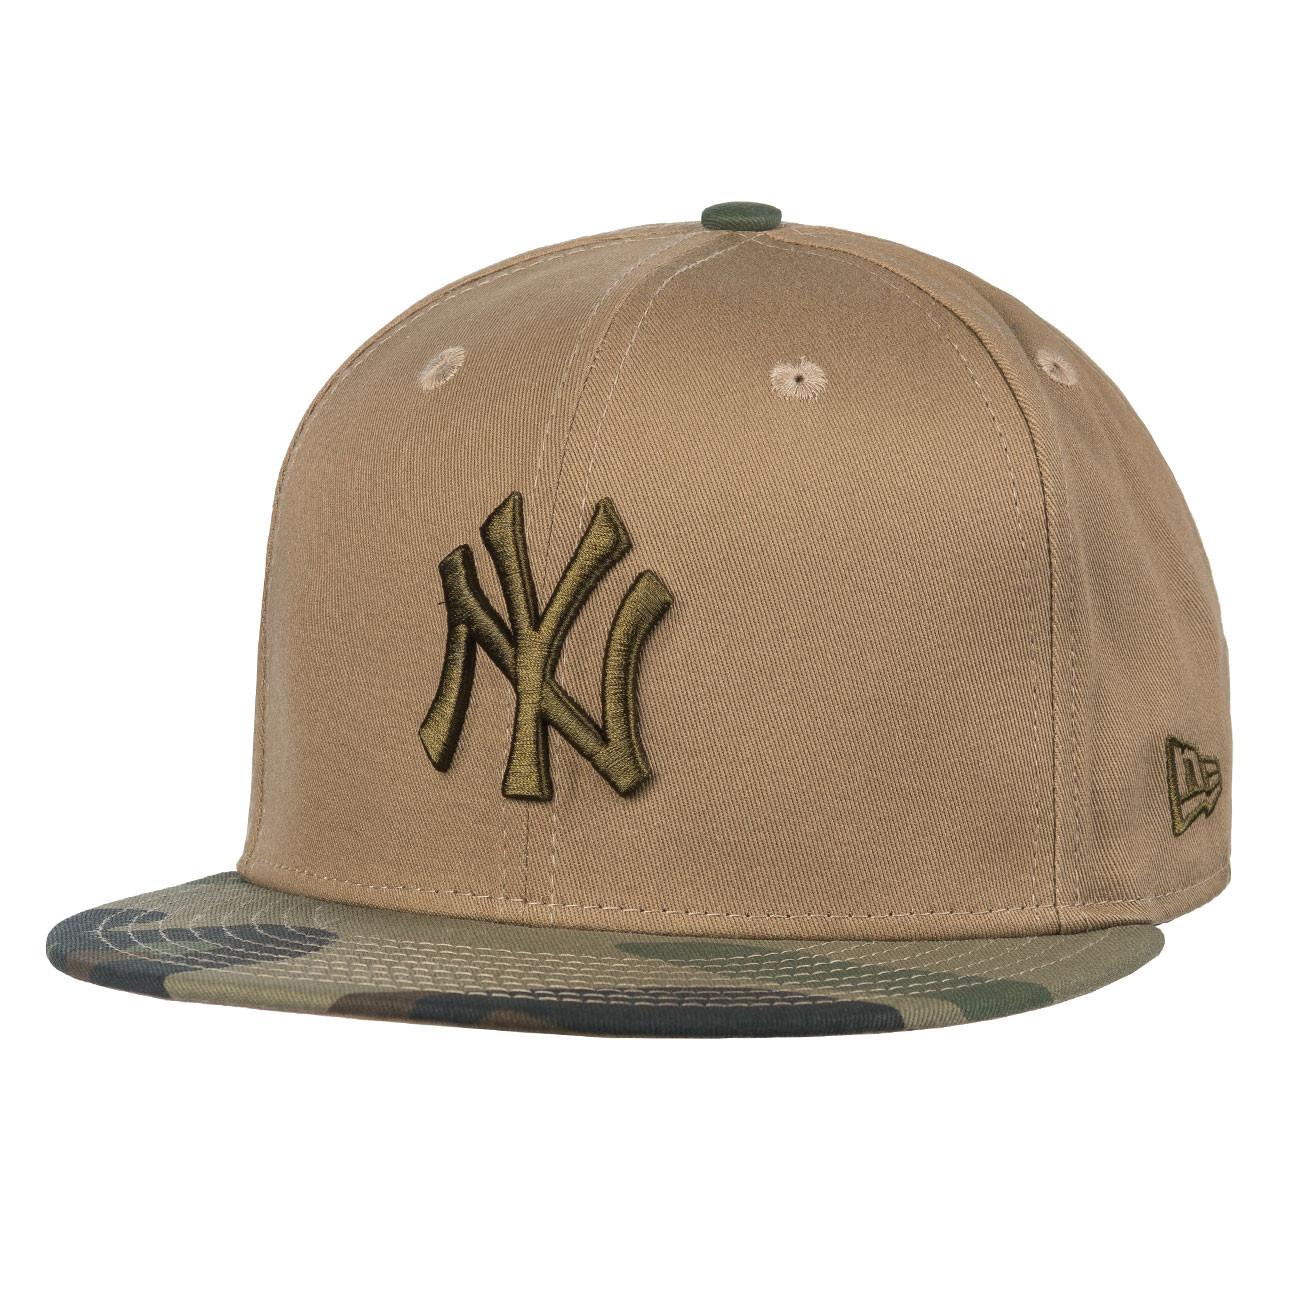 Cap New Era New York Yankees 59Fifty C.e. woodland camo khaki brown ... 5ed09d22972